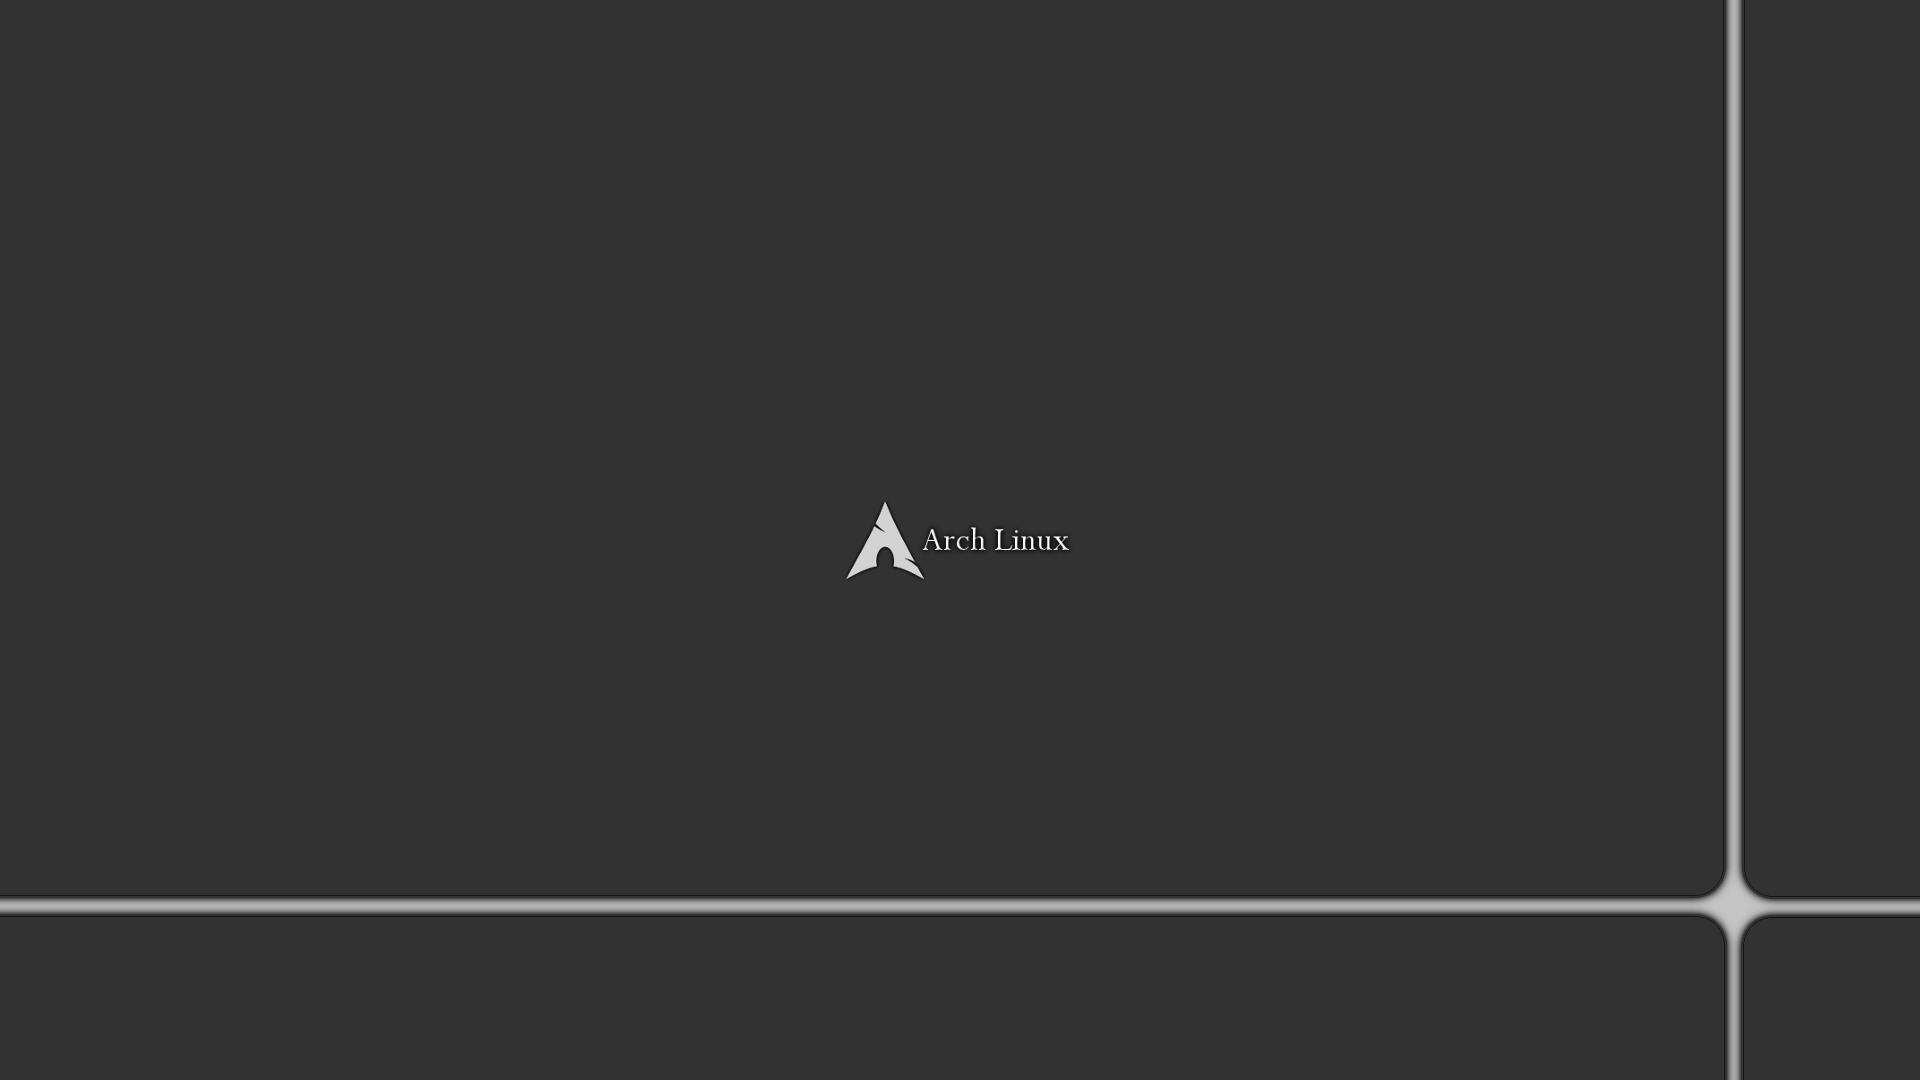 Dark Web Wallpapers - Top Free Dark Web